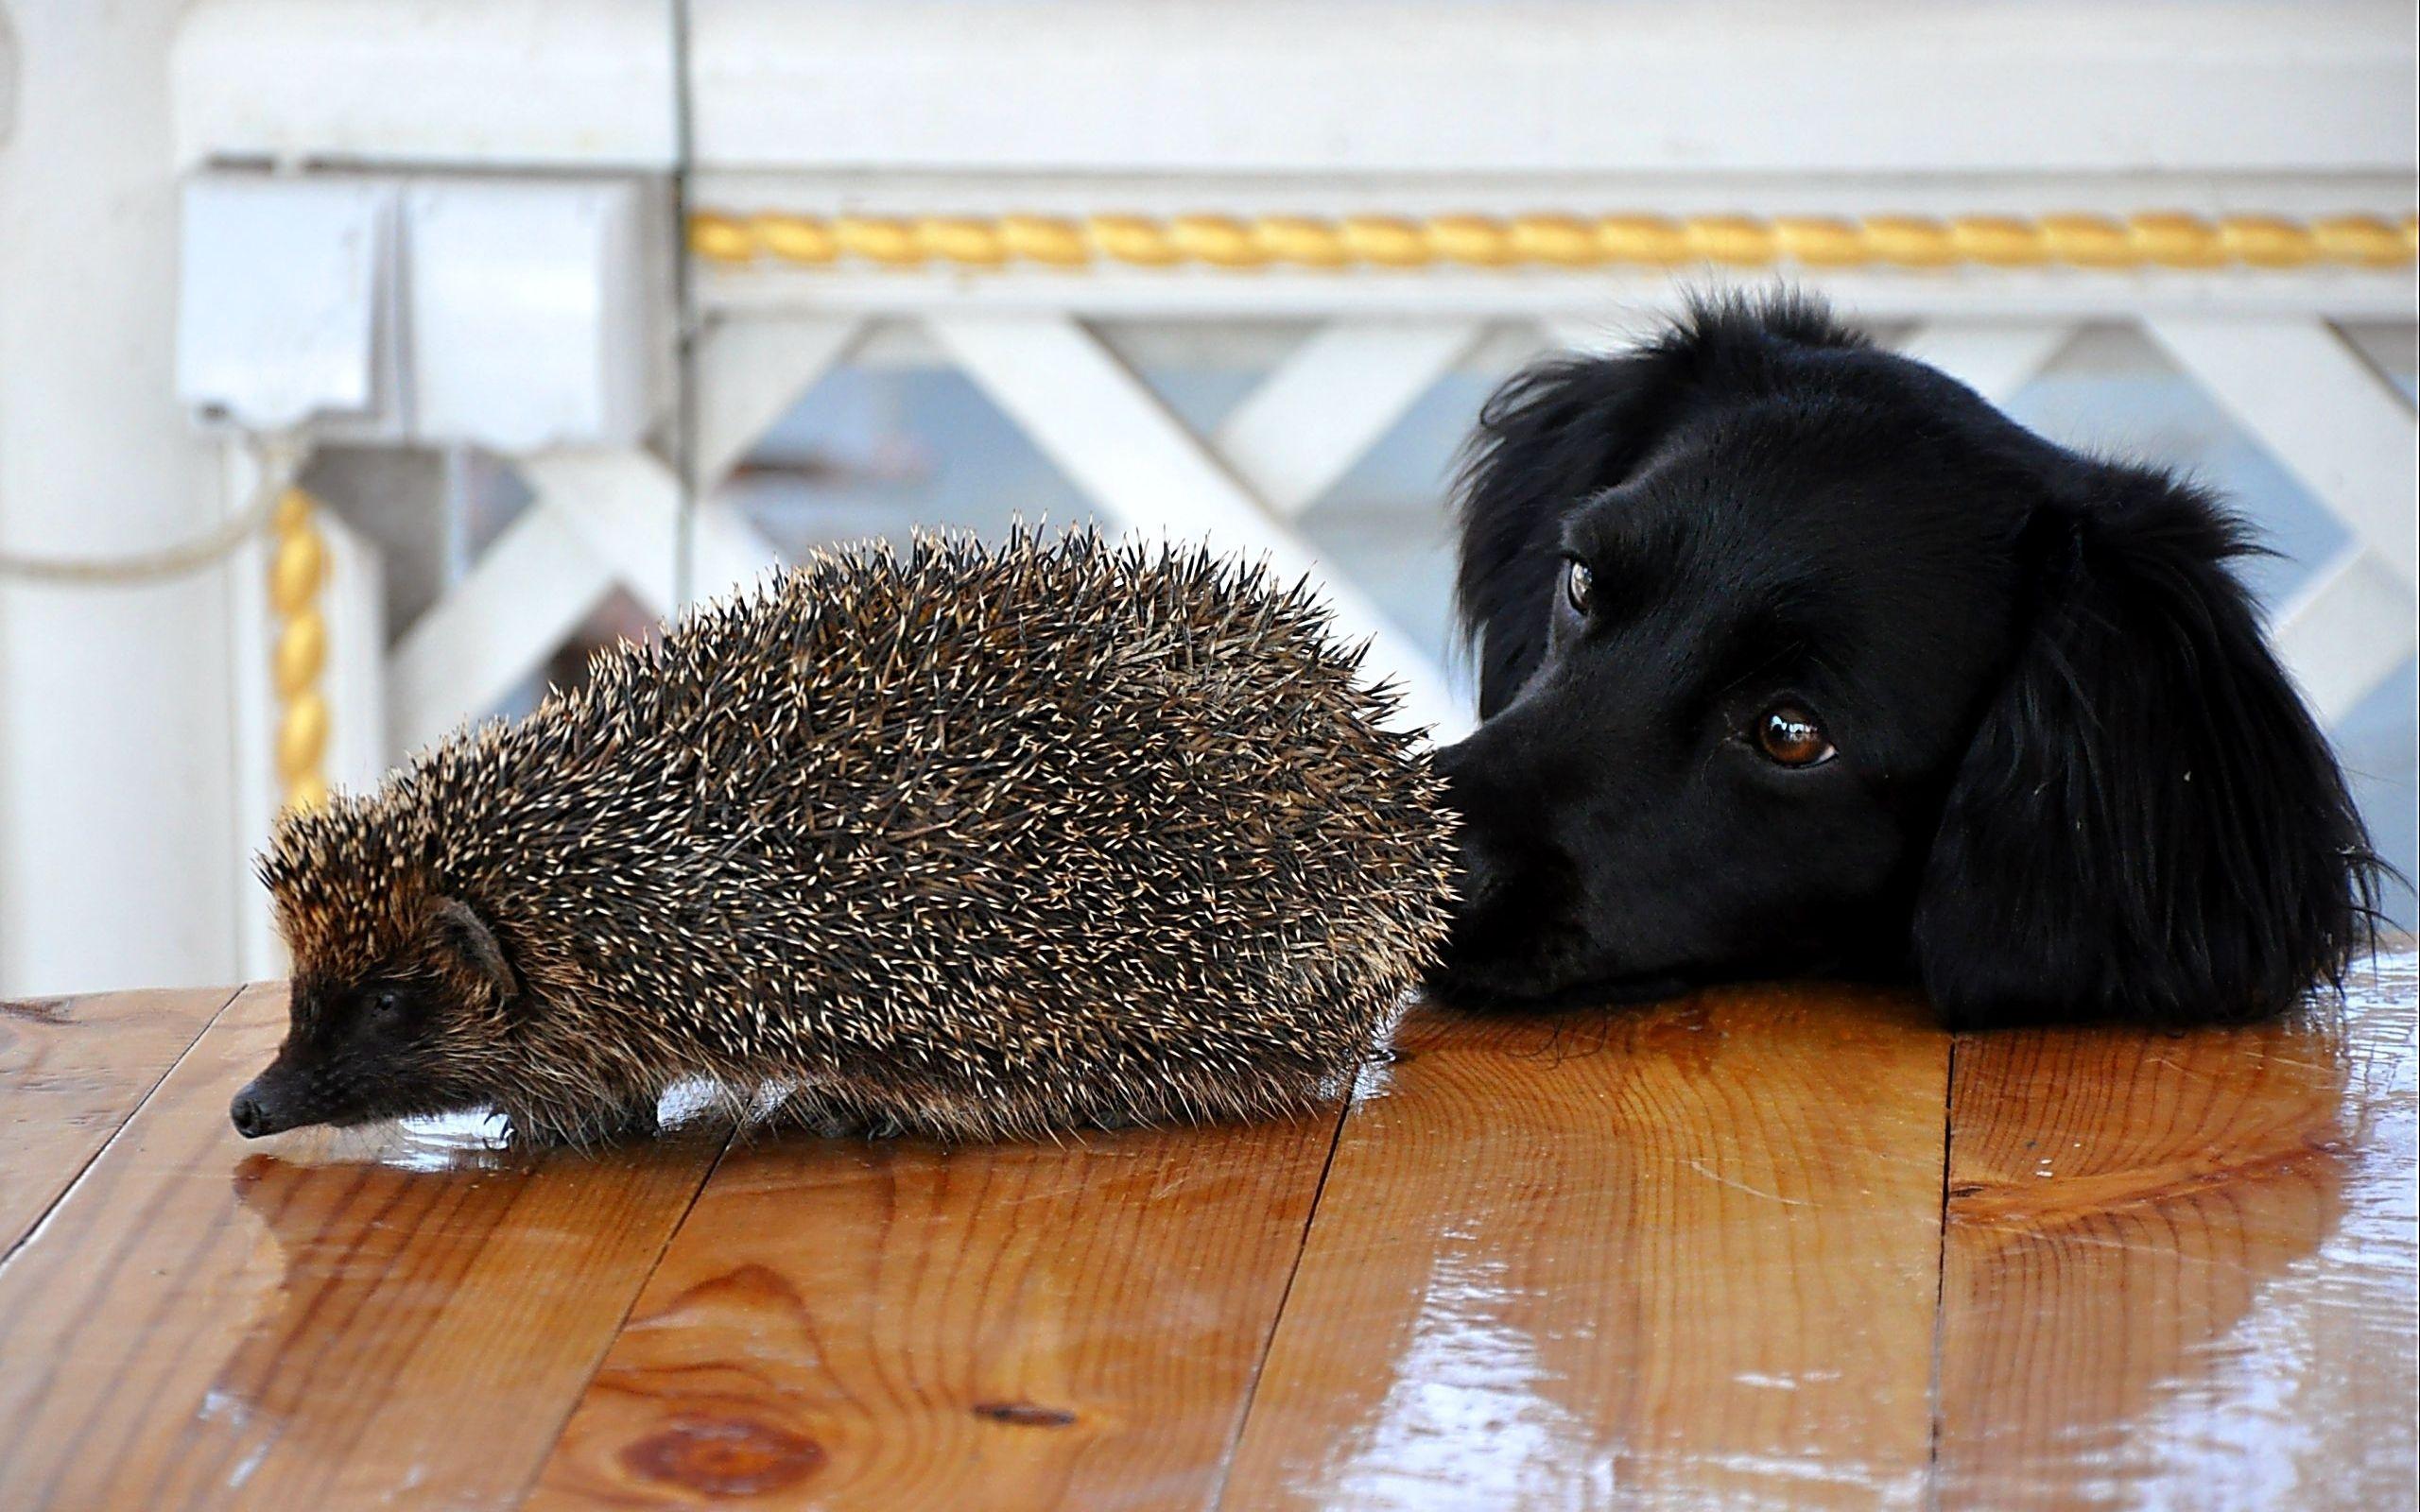 Dog and Hedgehog